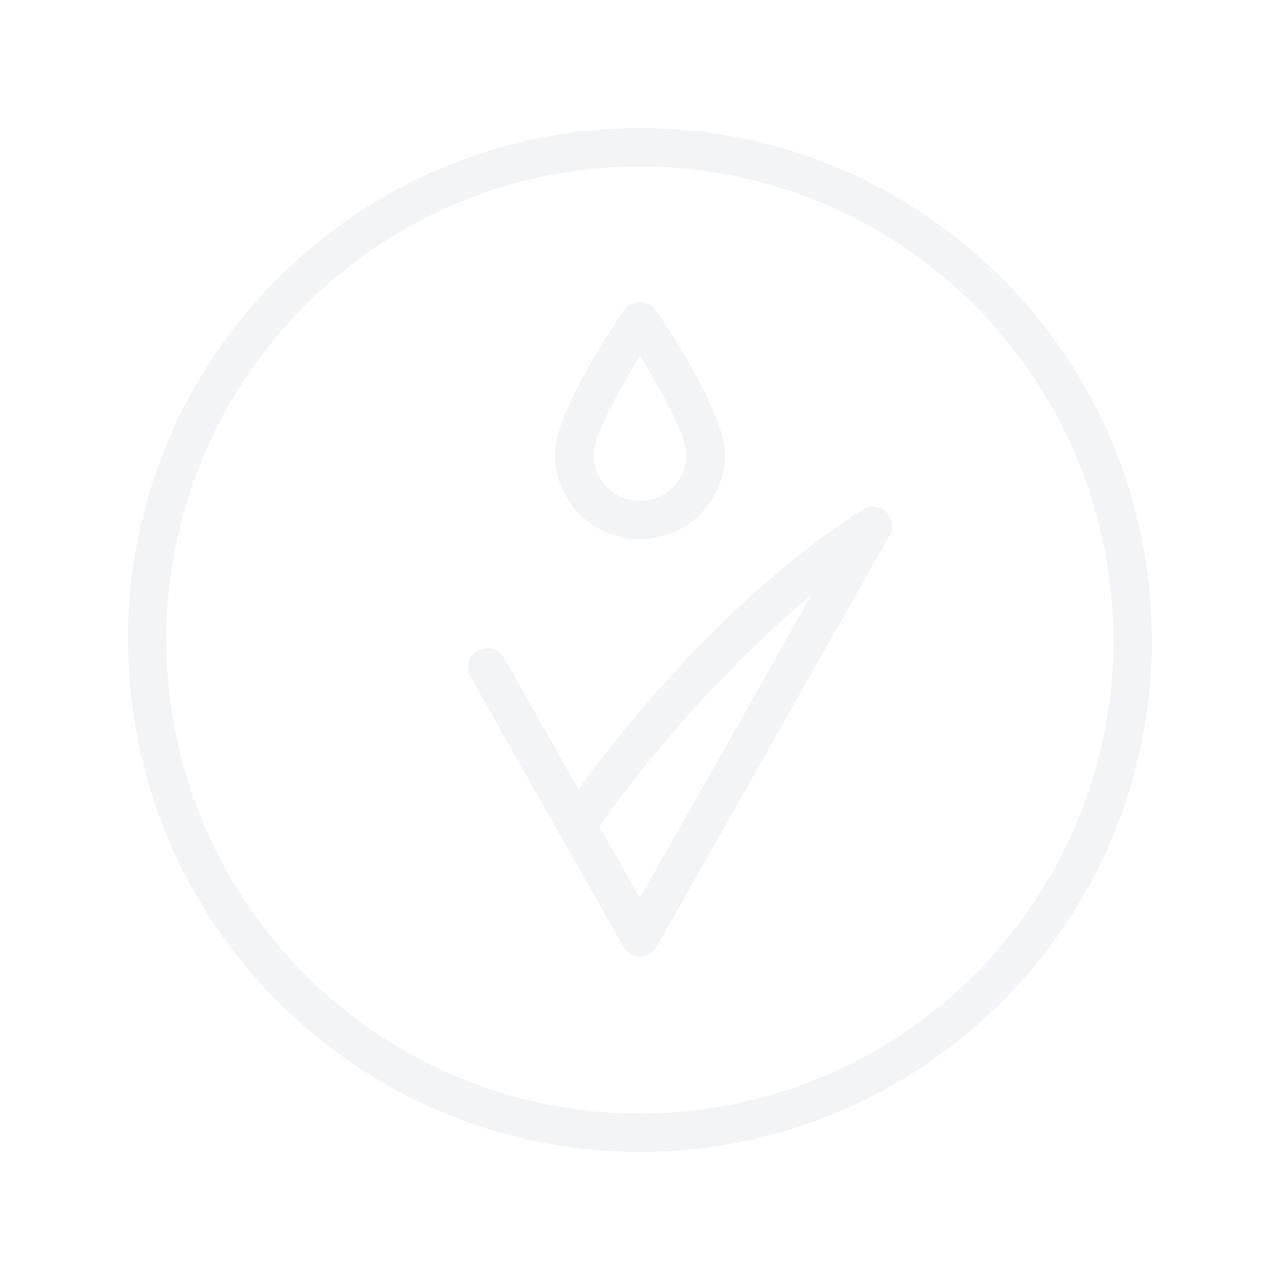 LUUV Moisturizing Body Cream With Green Tea & Aloe 200ml